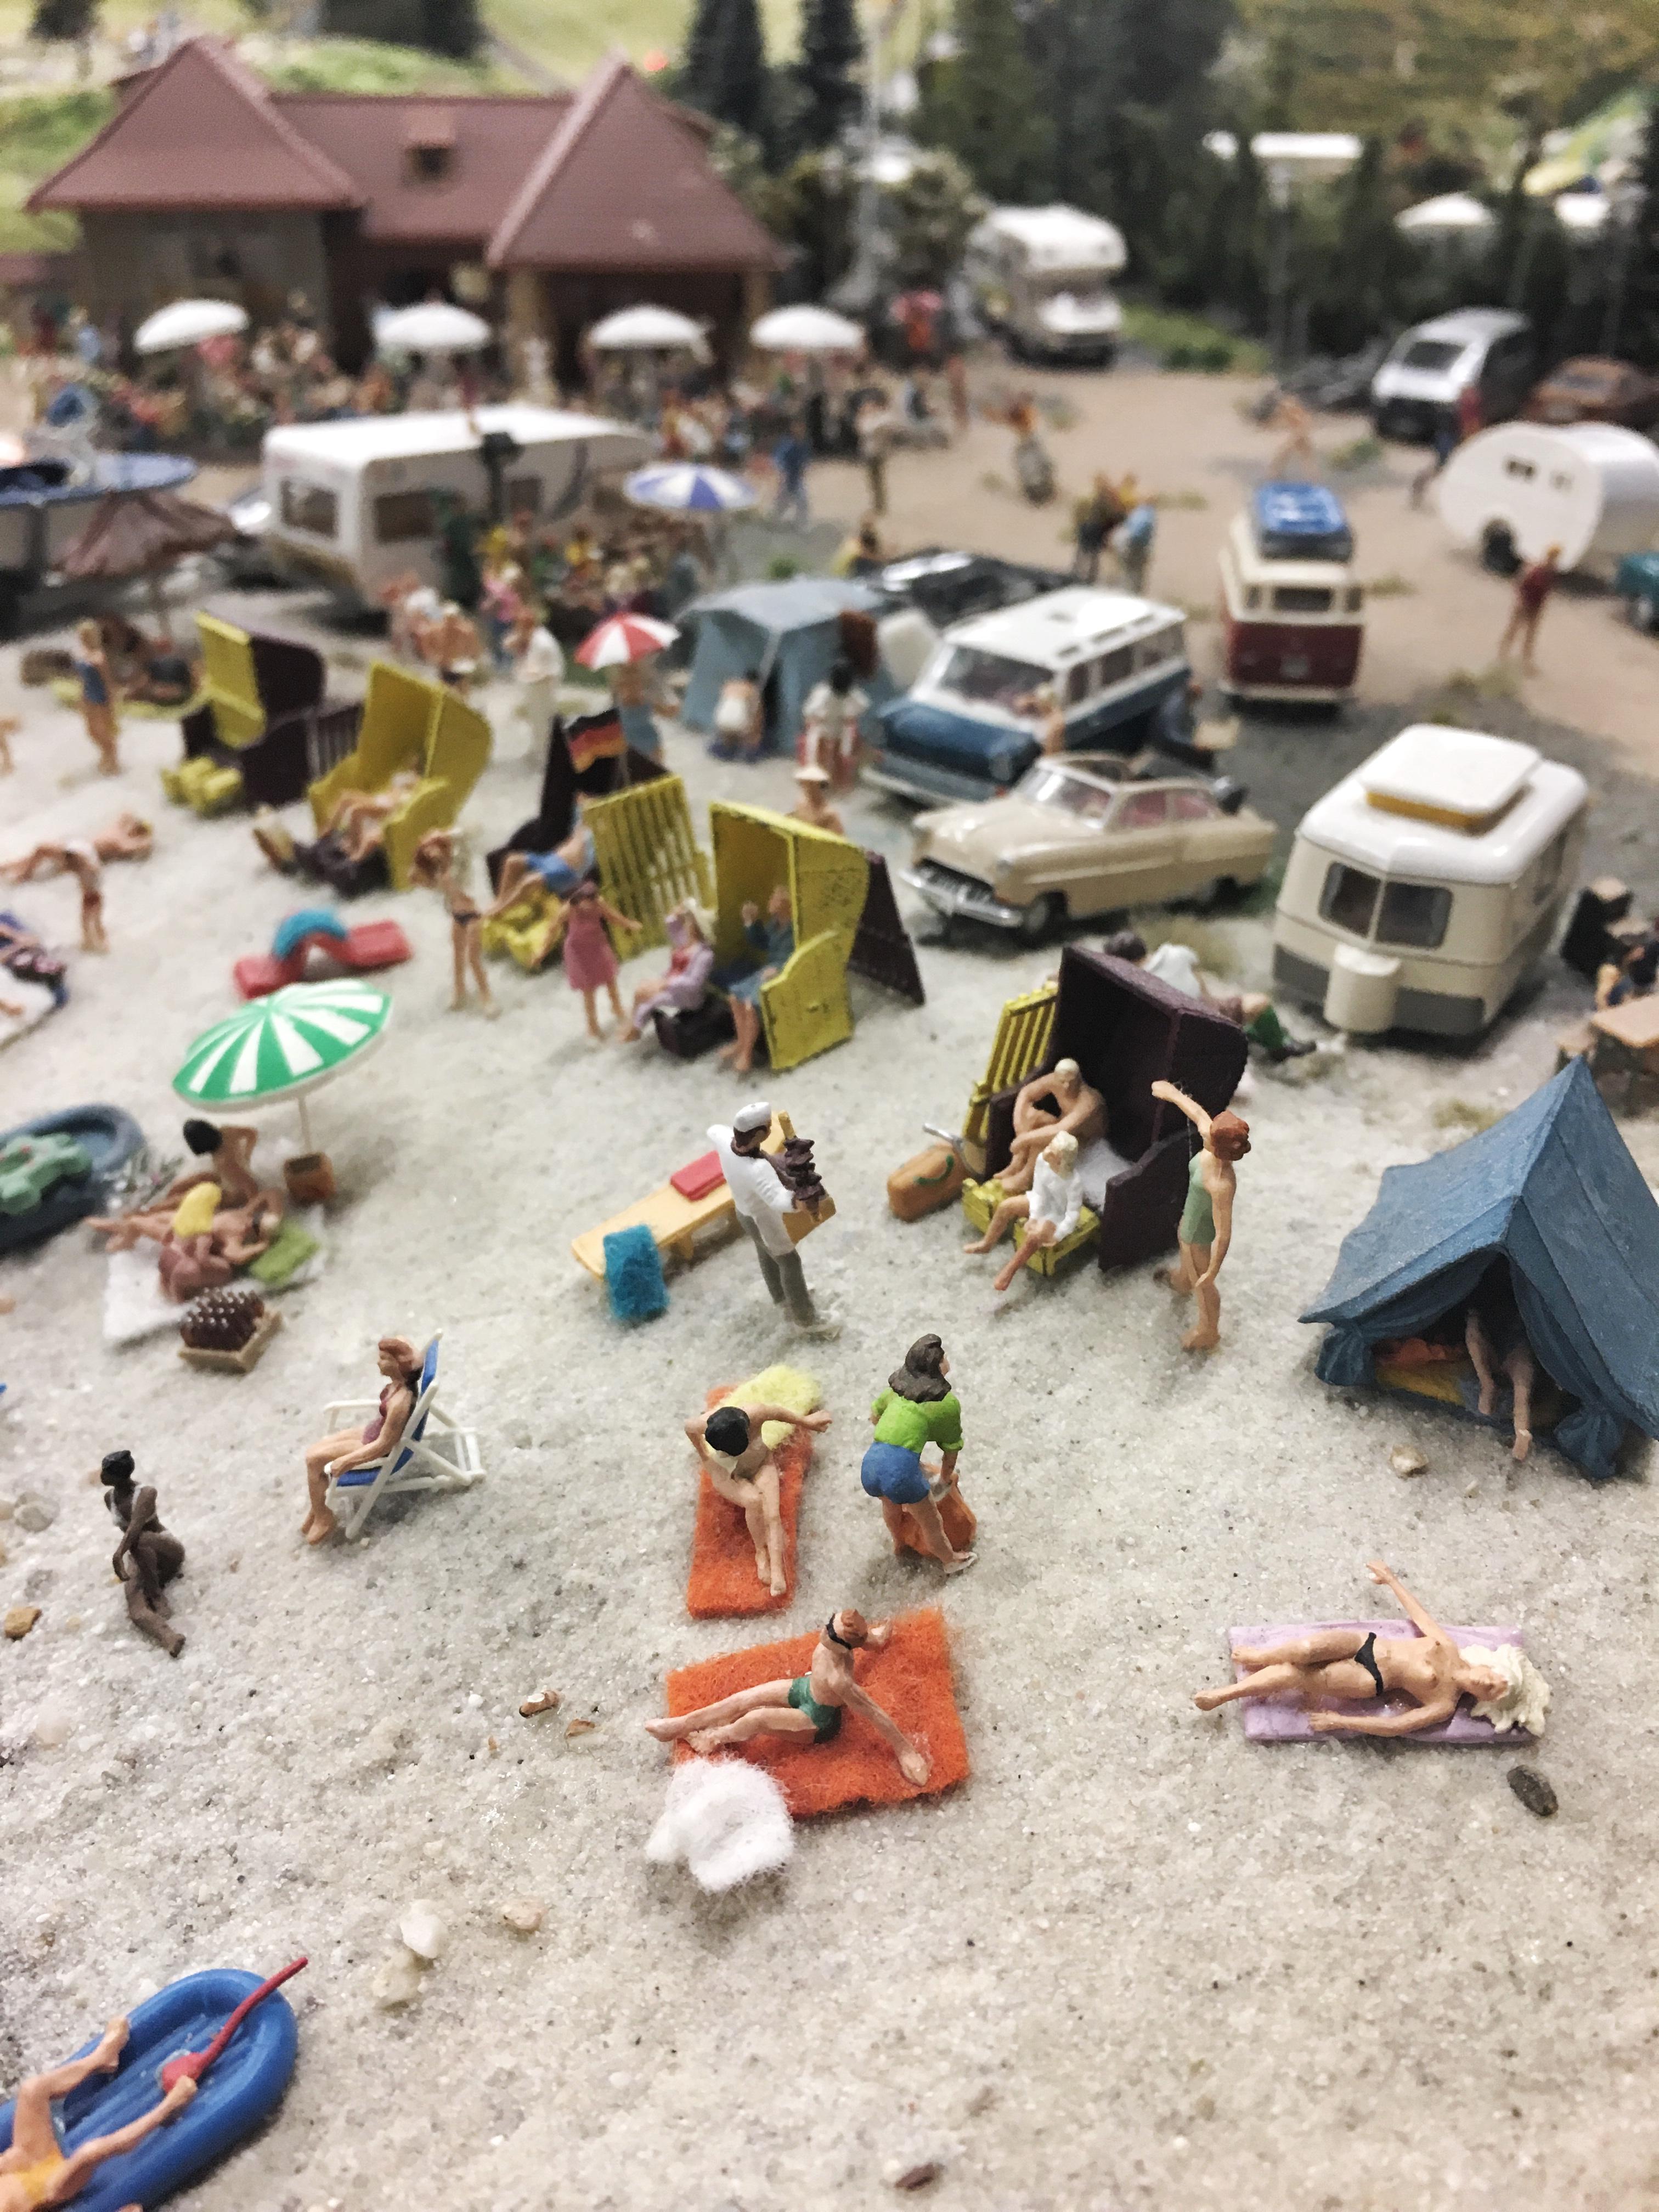 Tornare bambini a Miniature Wunderland